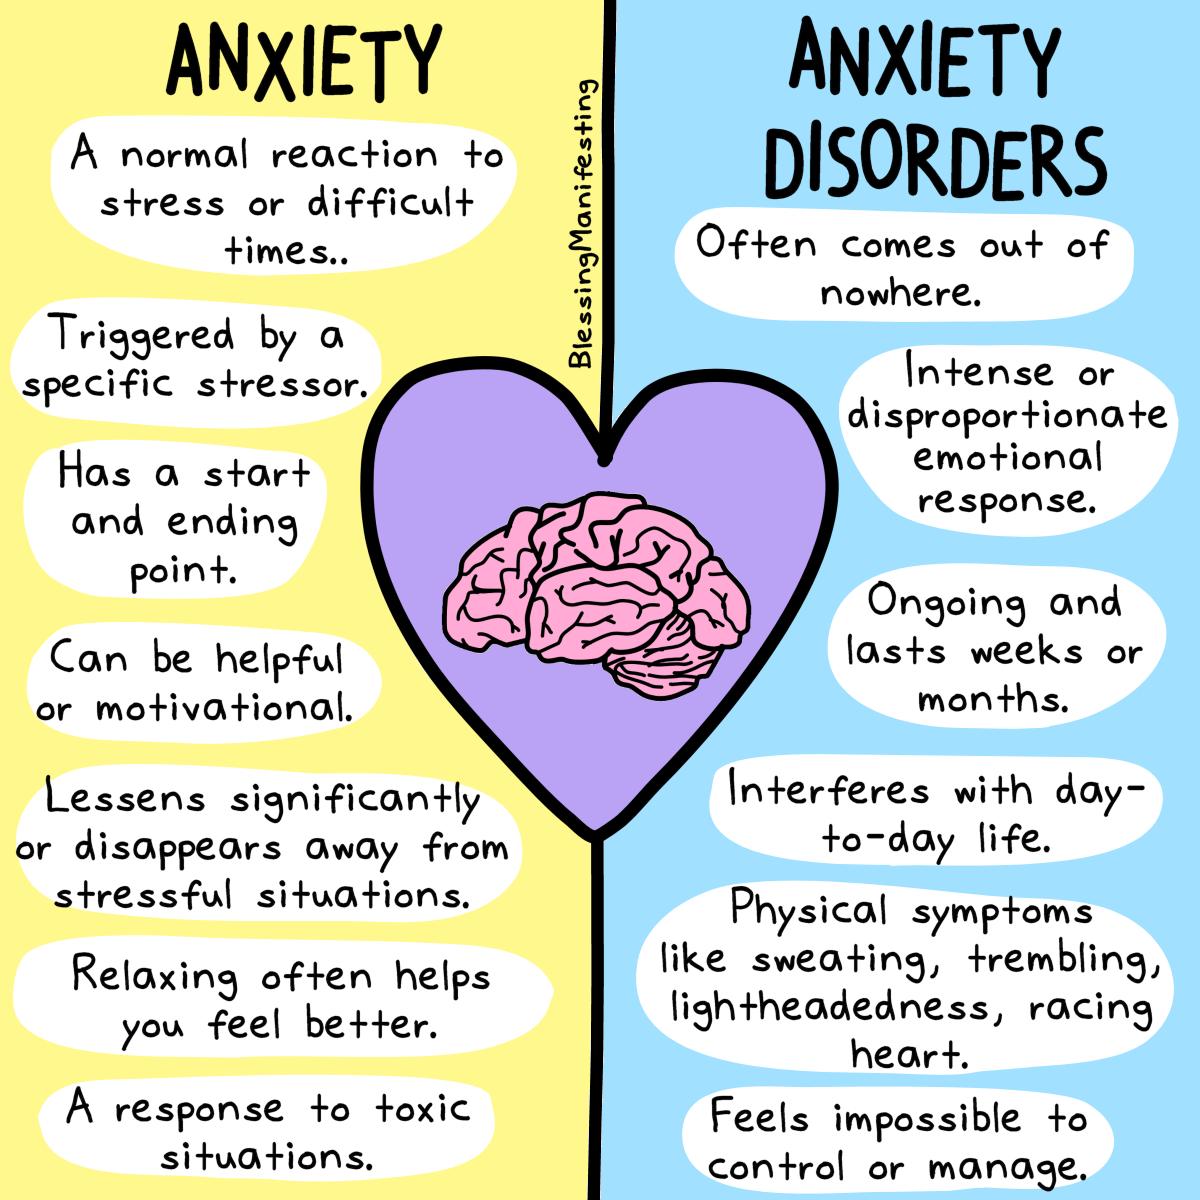 8 Ways to Beat Anxiety